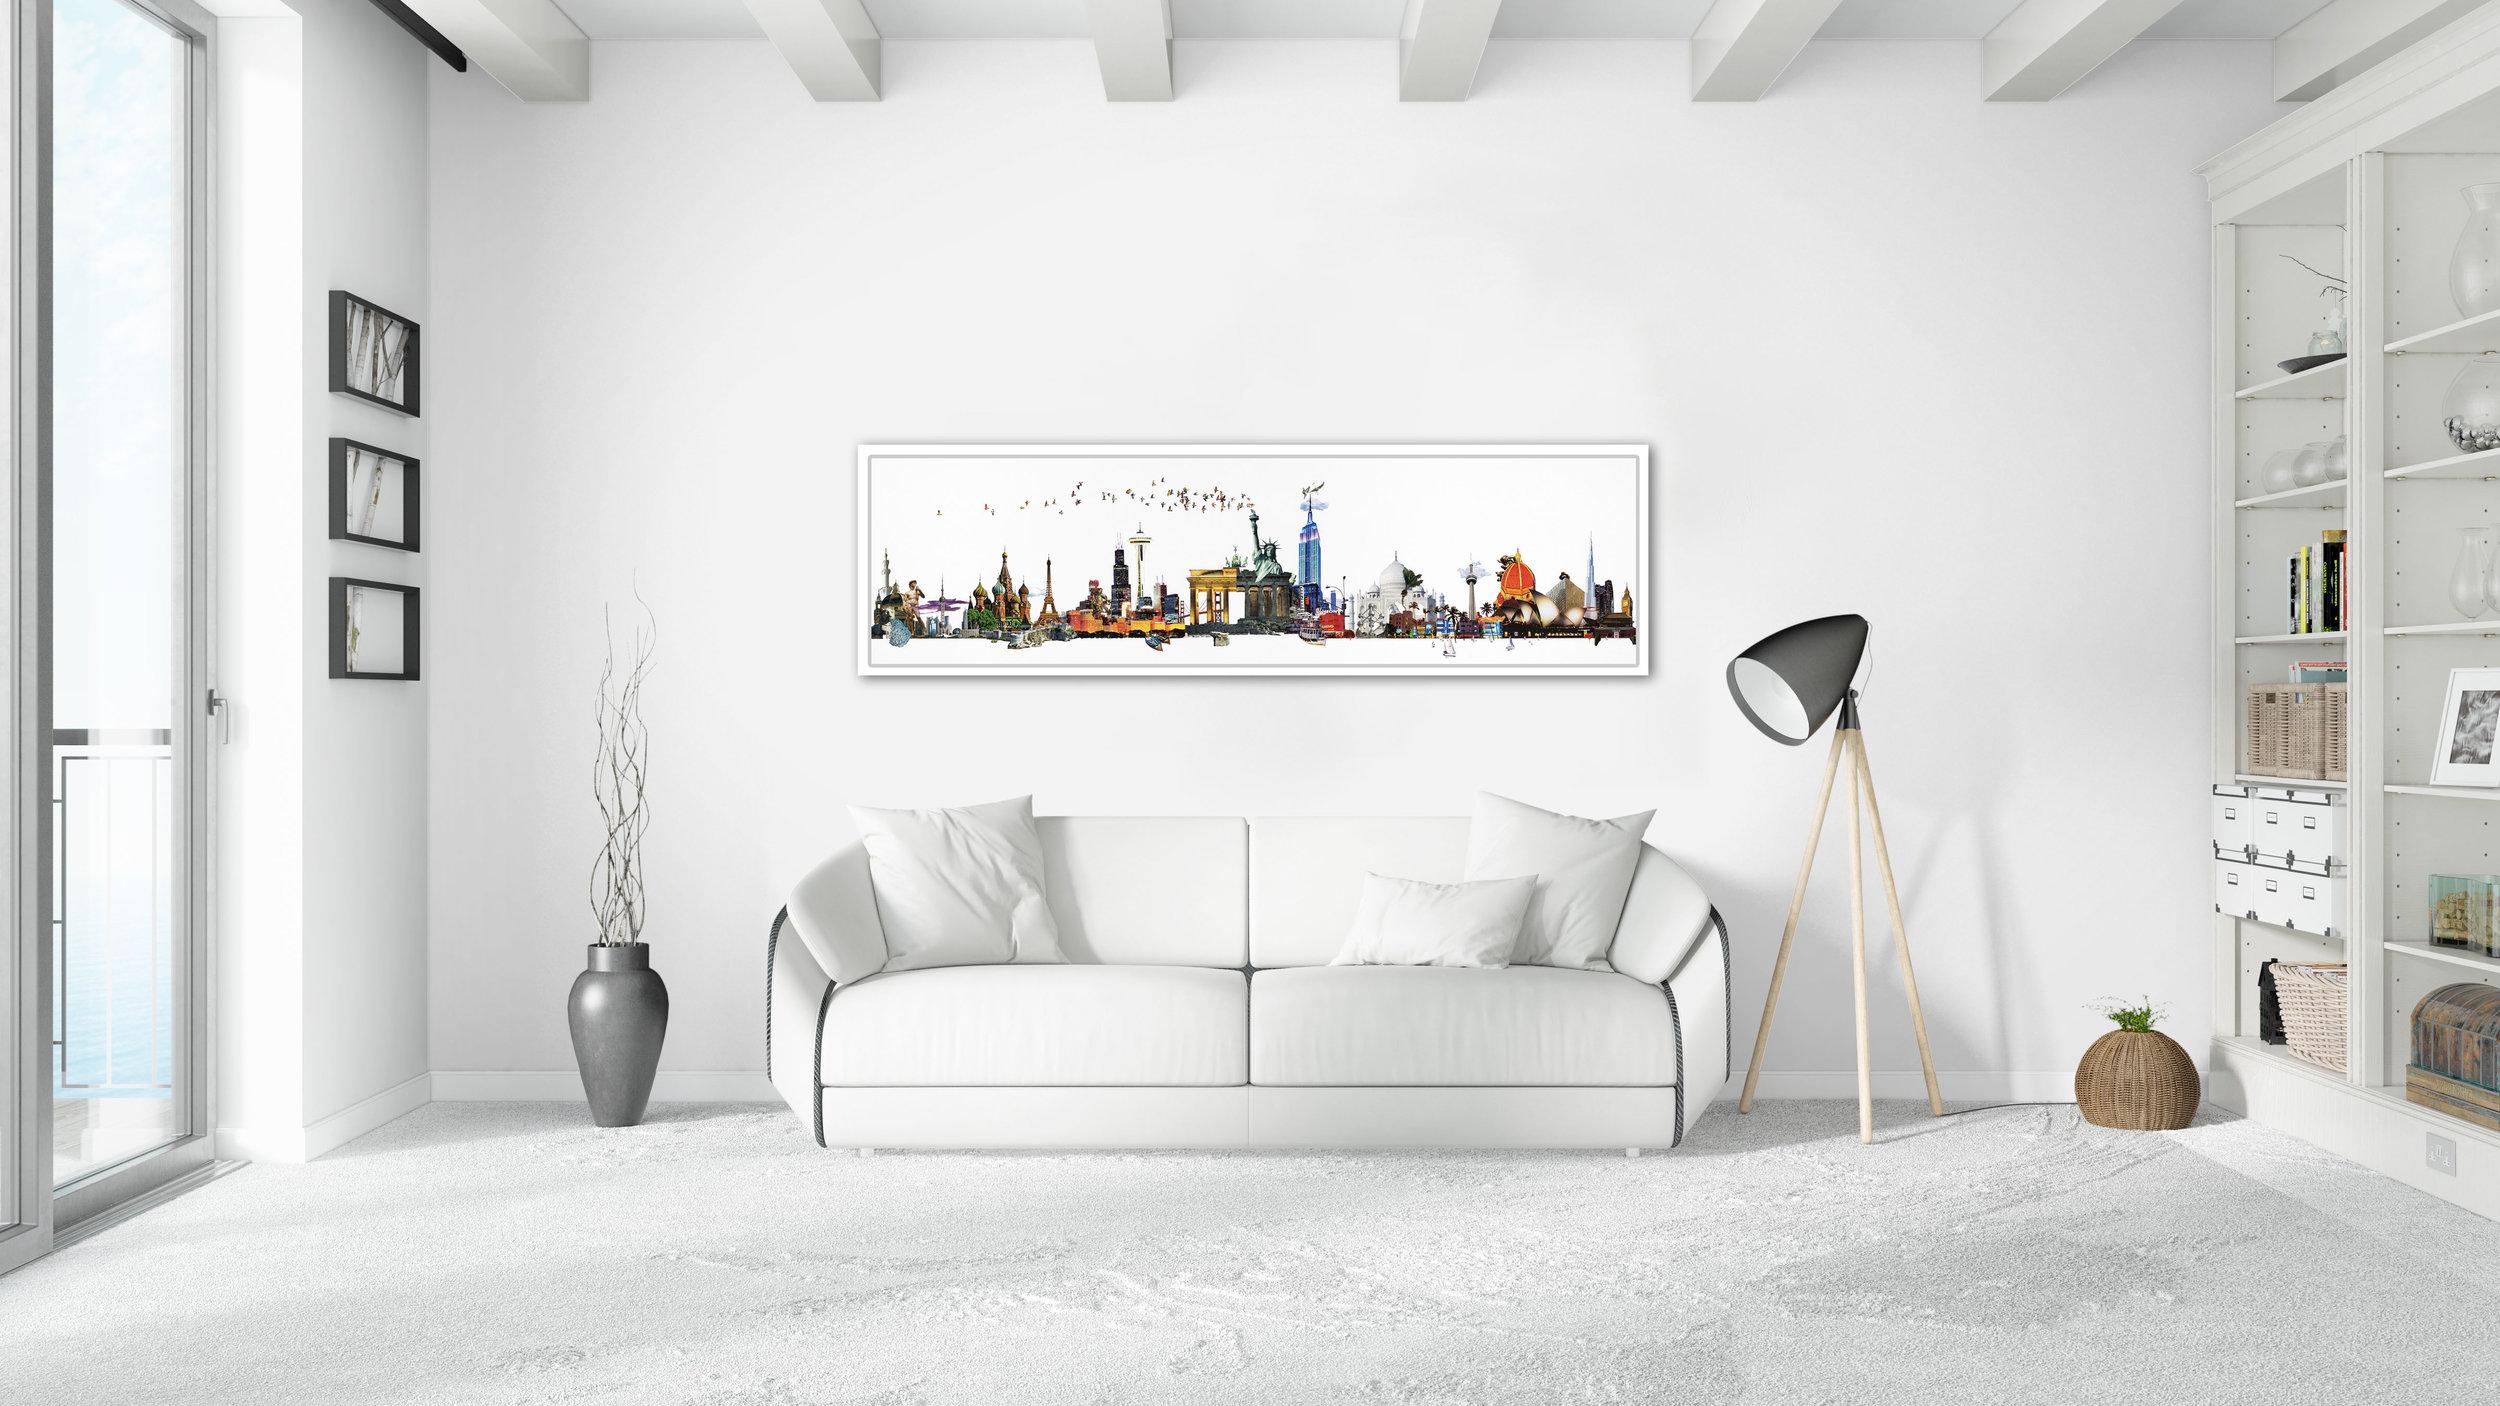 Skyline in interior space.jpg